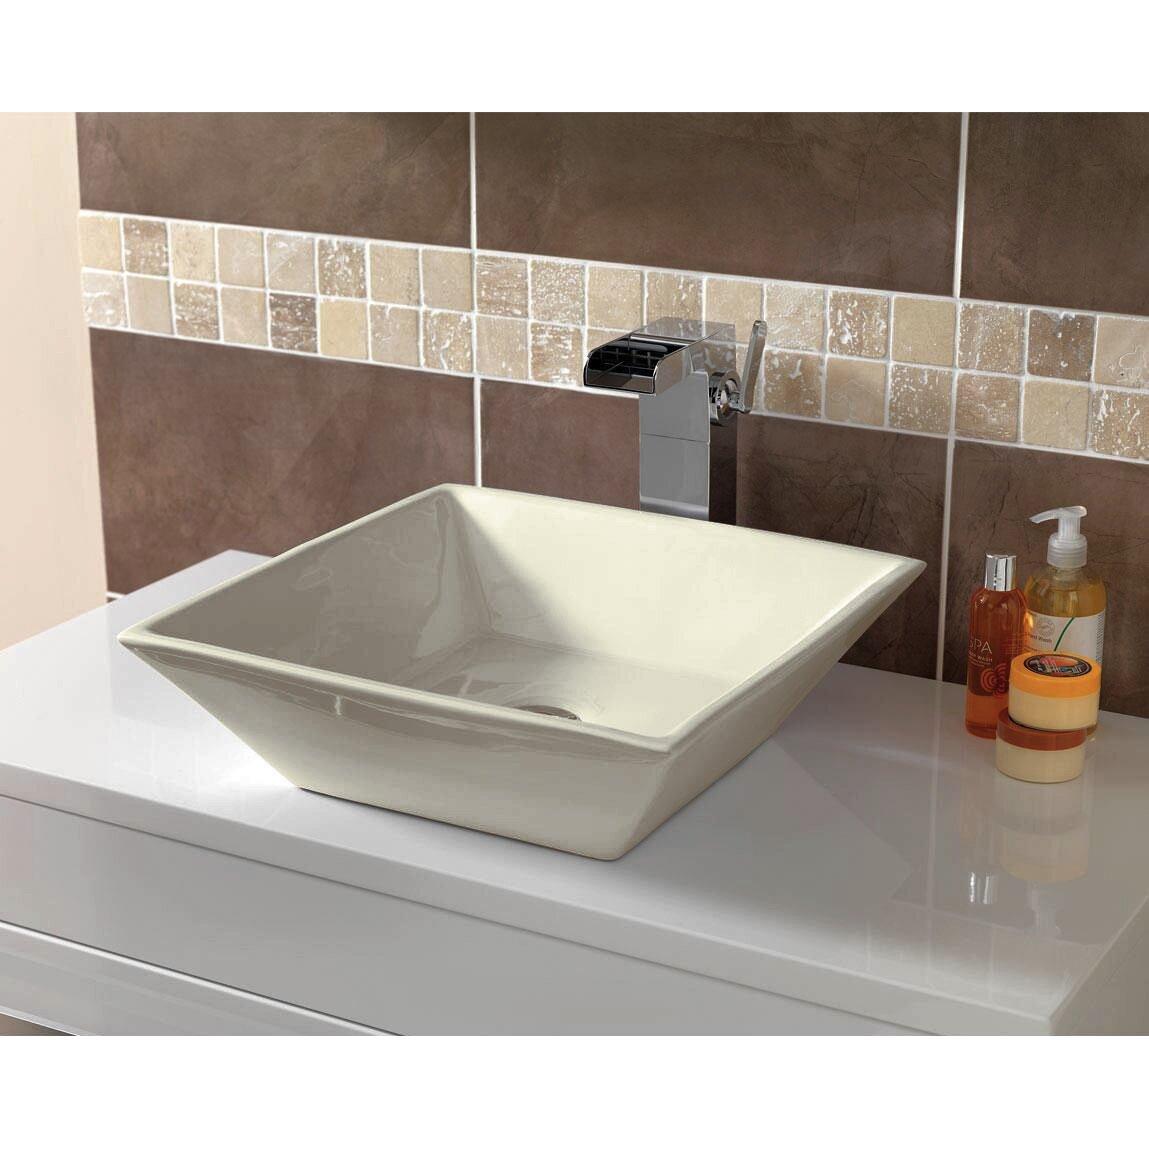 Square Vessel Bathroom Sink : American Imaginations Square Vessel bathroom Sink Wayfair